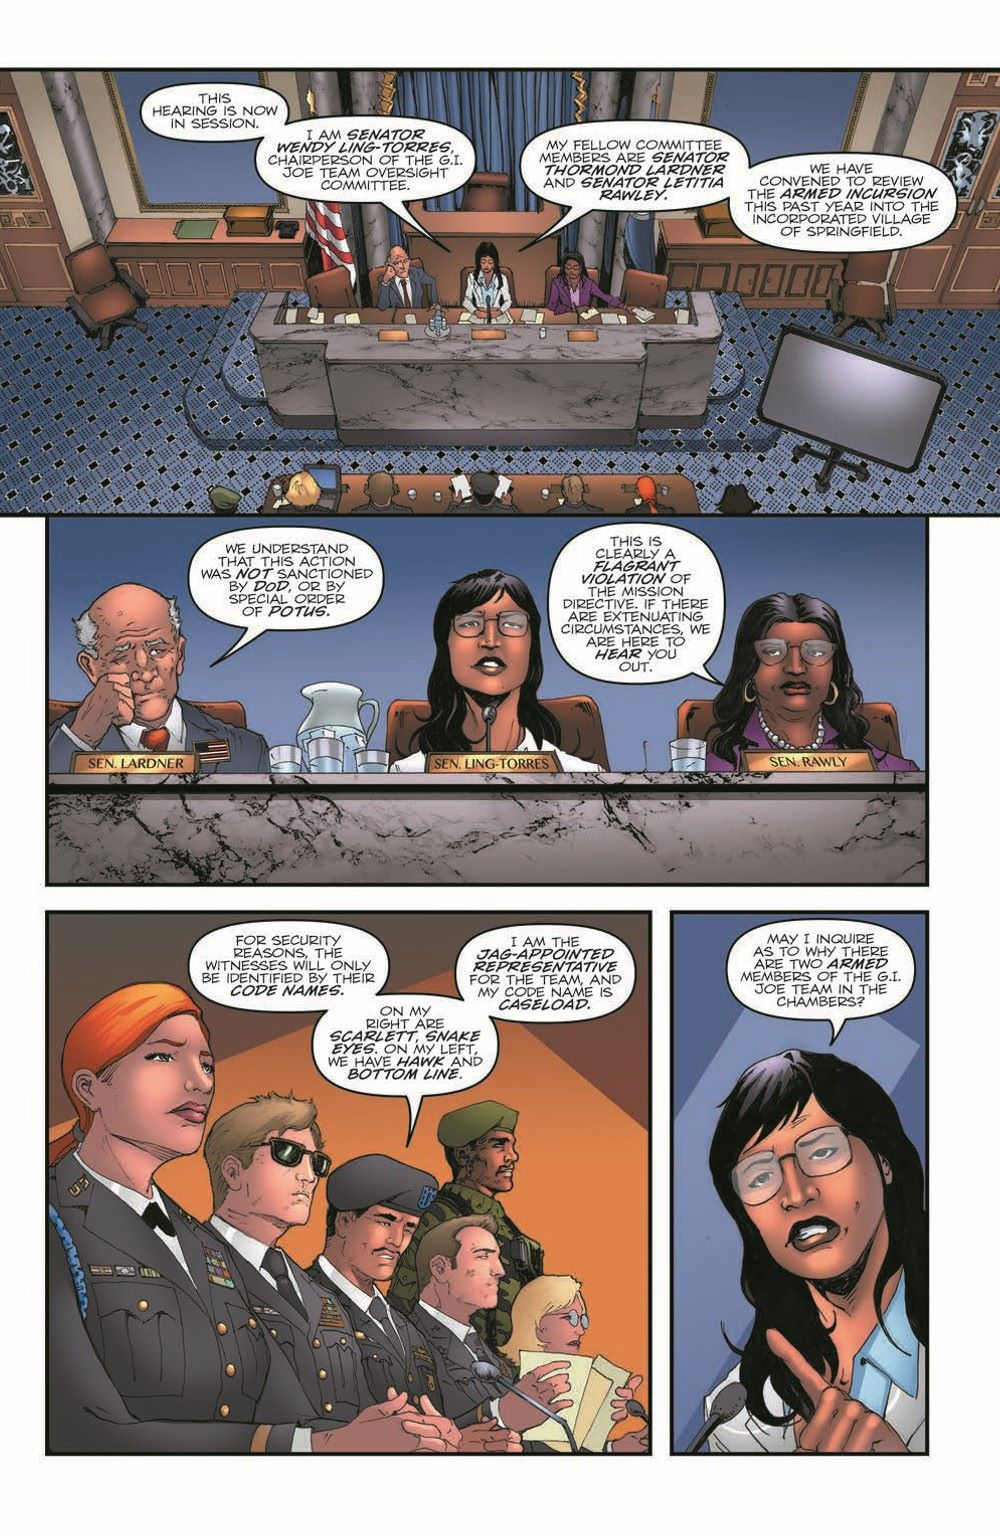 GIJoeRAH282-pr-4 ComicList Previews: G.I. JOE A REAL AMERICAN HERO #282